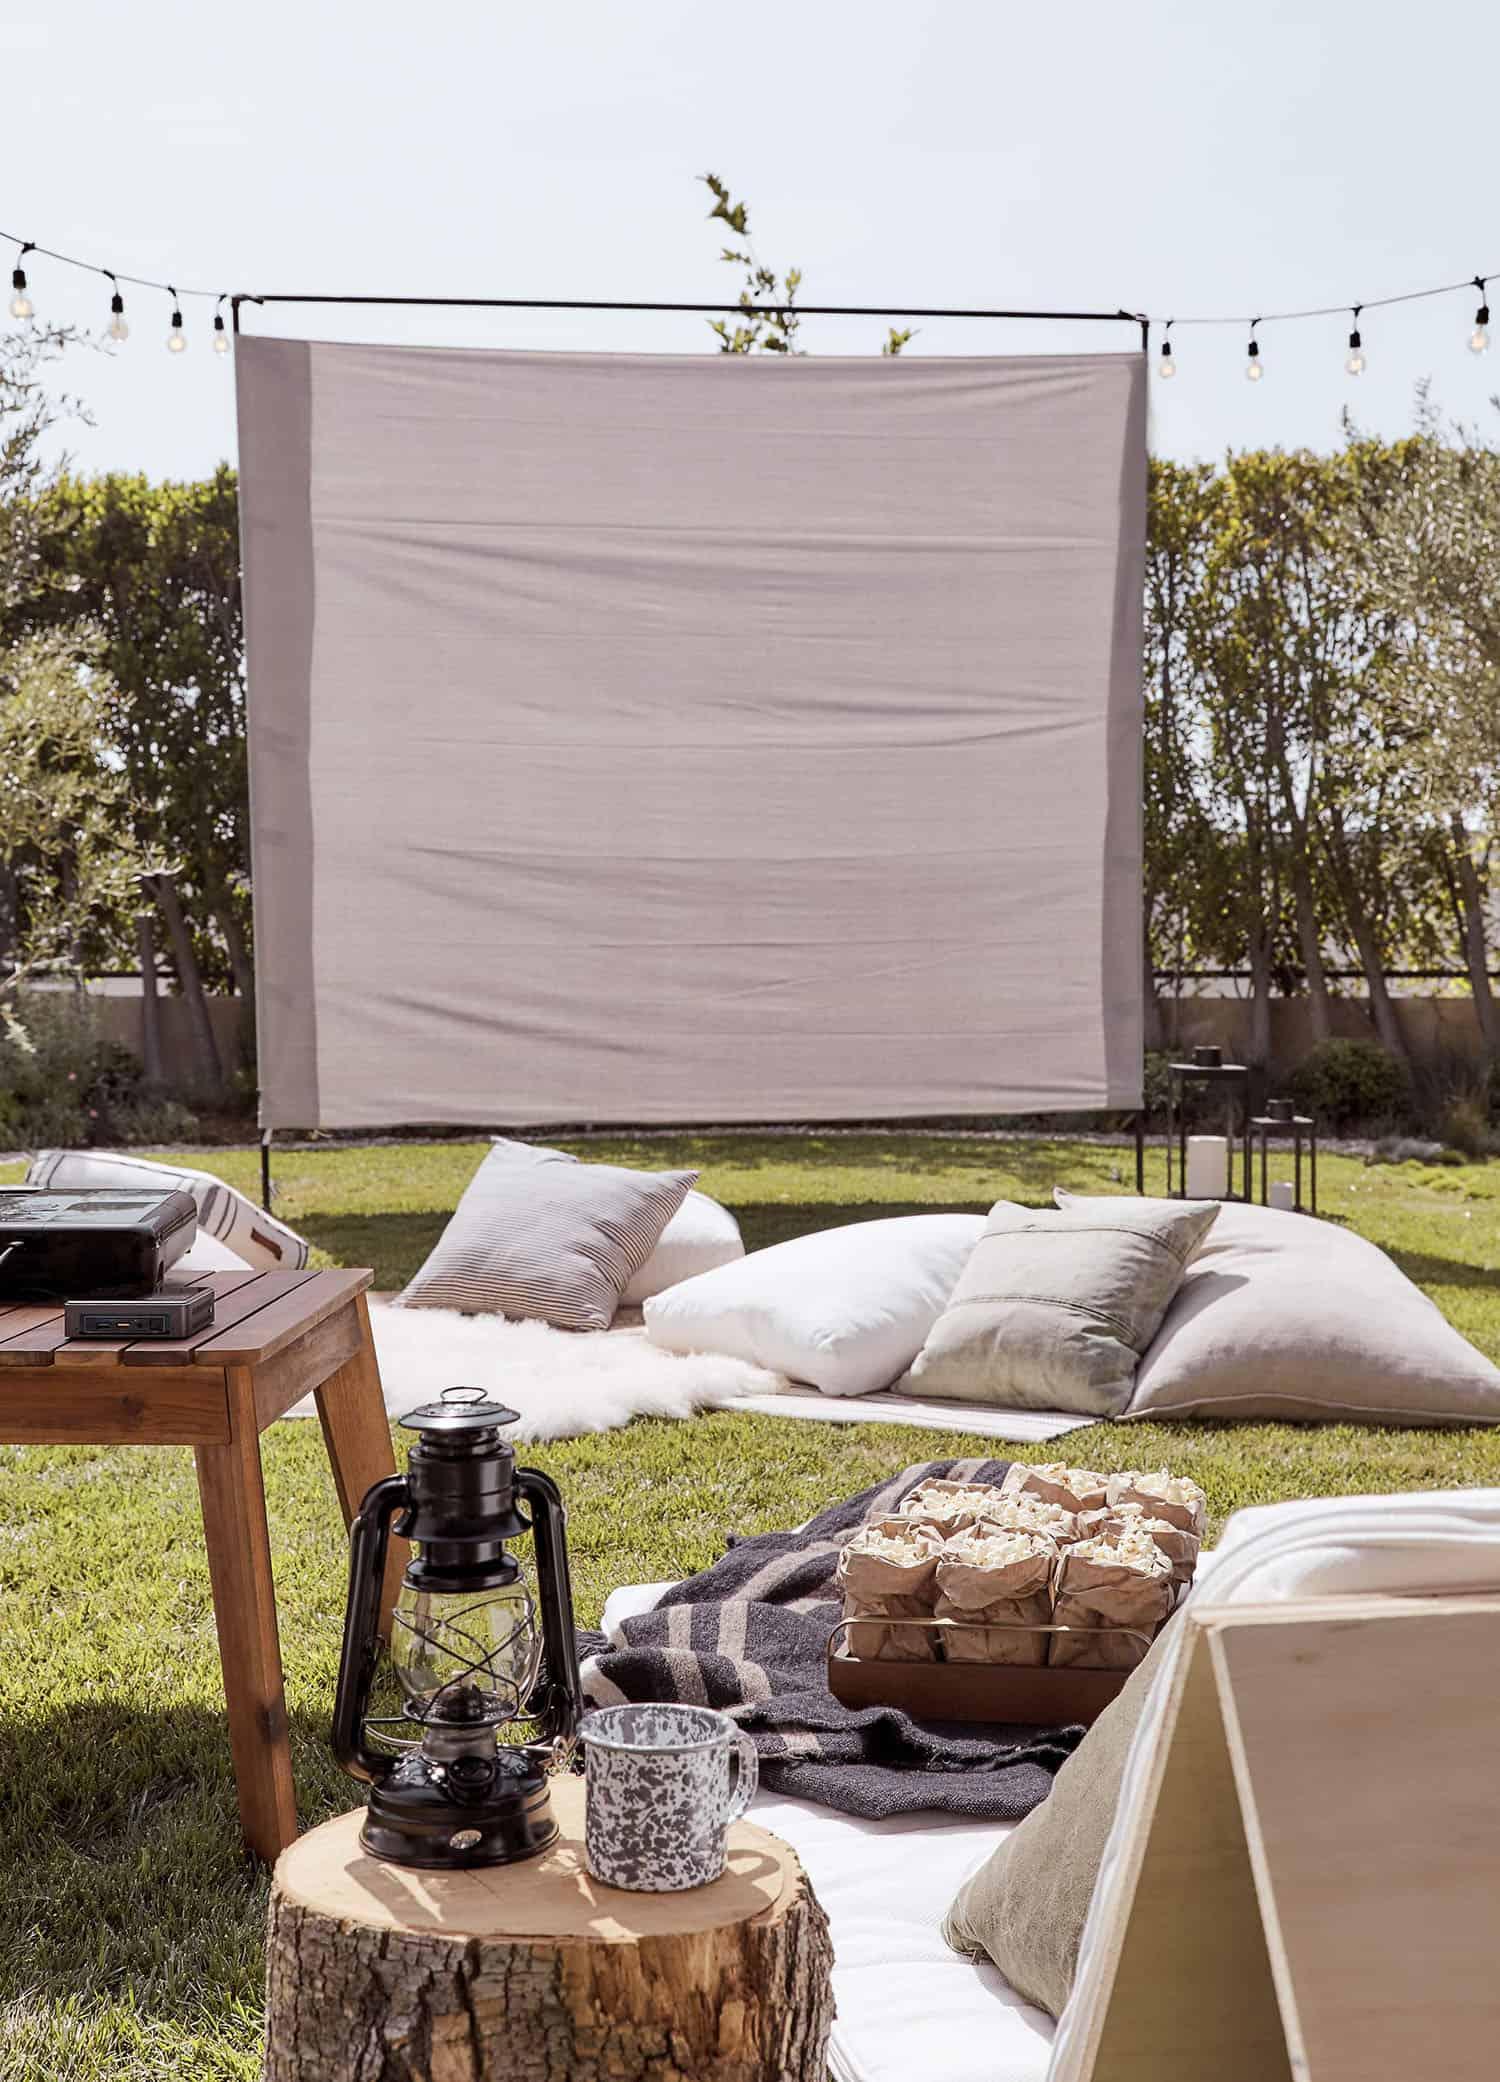 outdoor-movie-screen-ideas